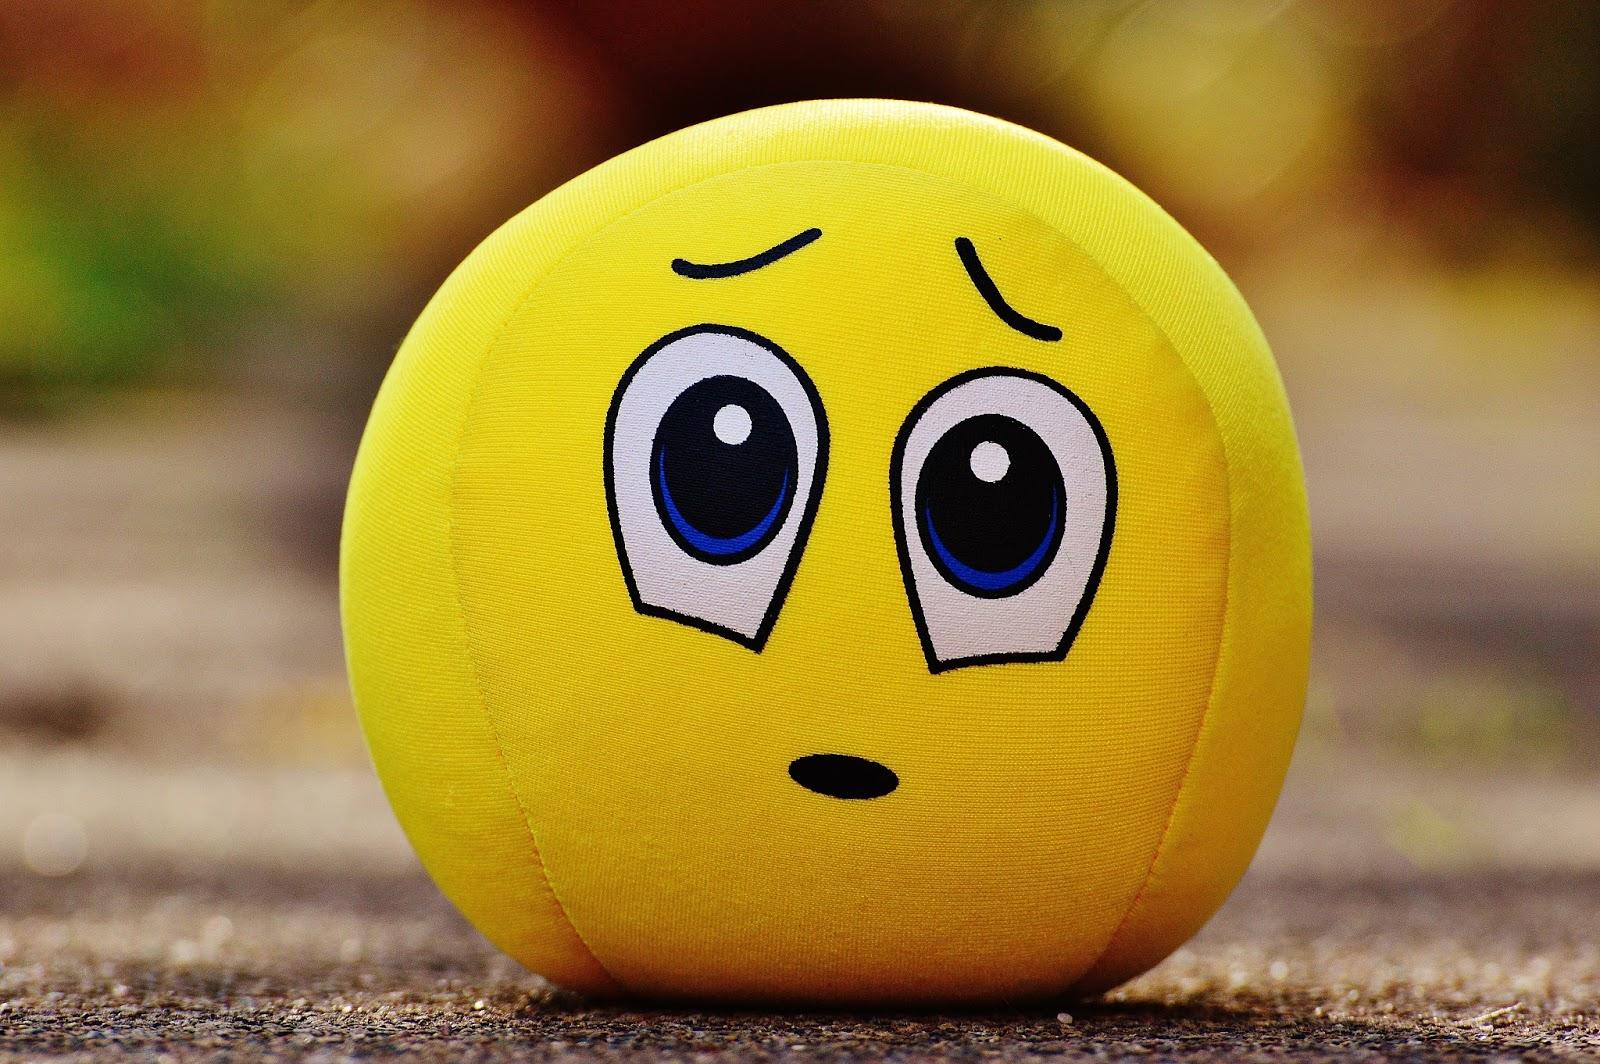 20+ Sad Emoji HD Wallpapers Free Download - Free HD Wallpapers